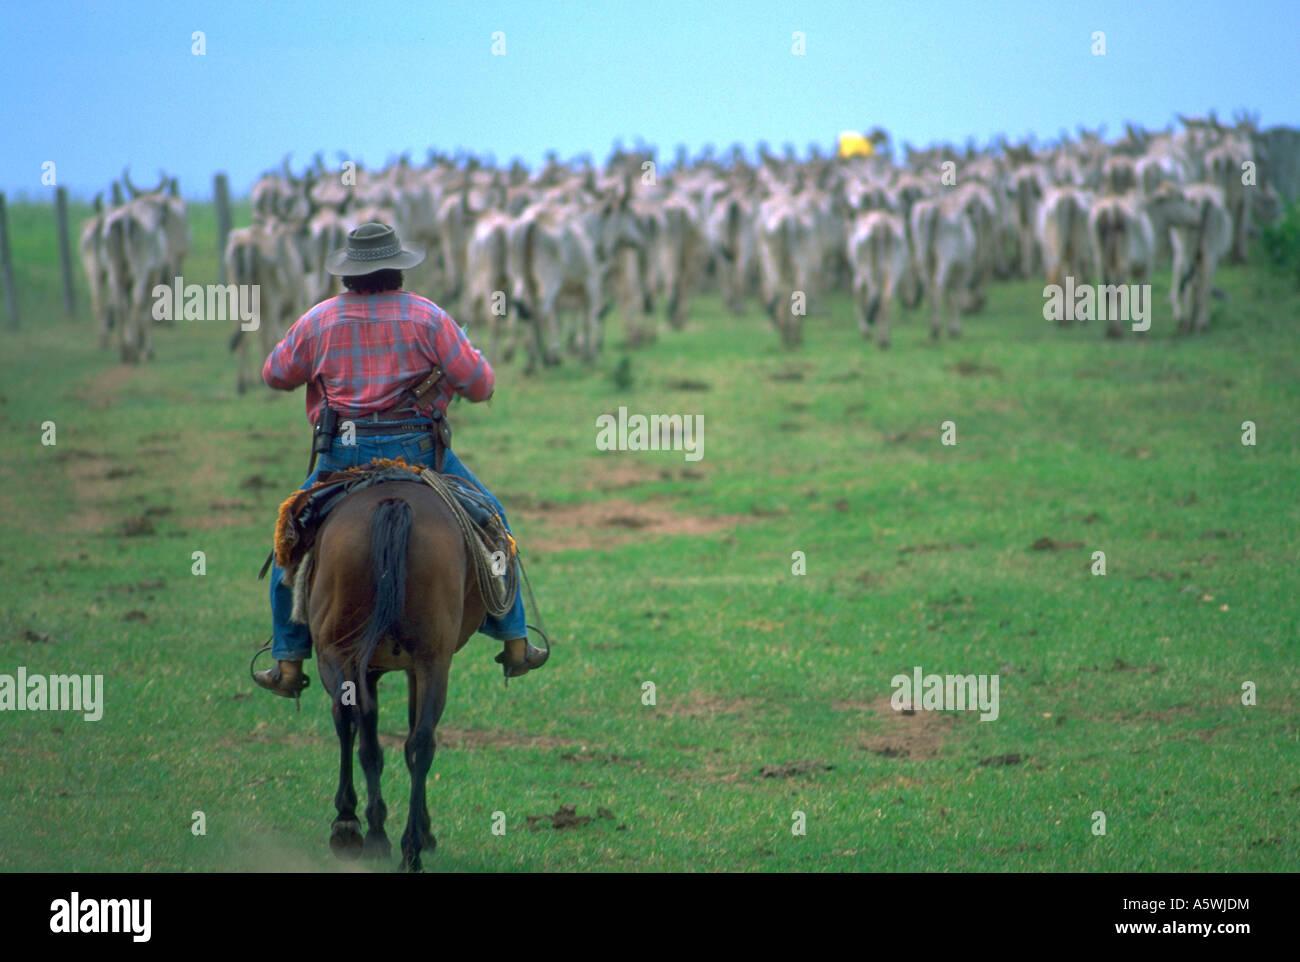 Painet Hk2377 Pantanerio Cowboy Leitet Diese Herde Rinder Zurck Pantane Kaiman Ranch Mato Grosso Bereich Pantanal Brasilien Mit Der Angst